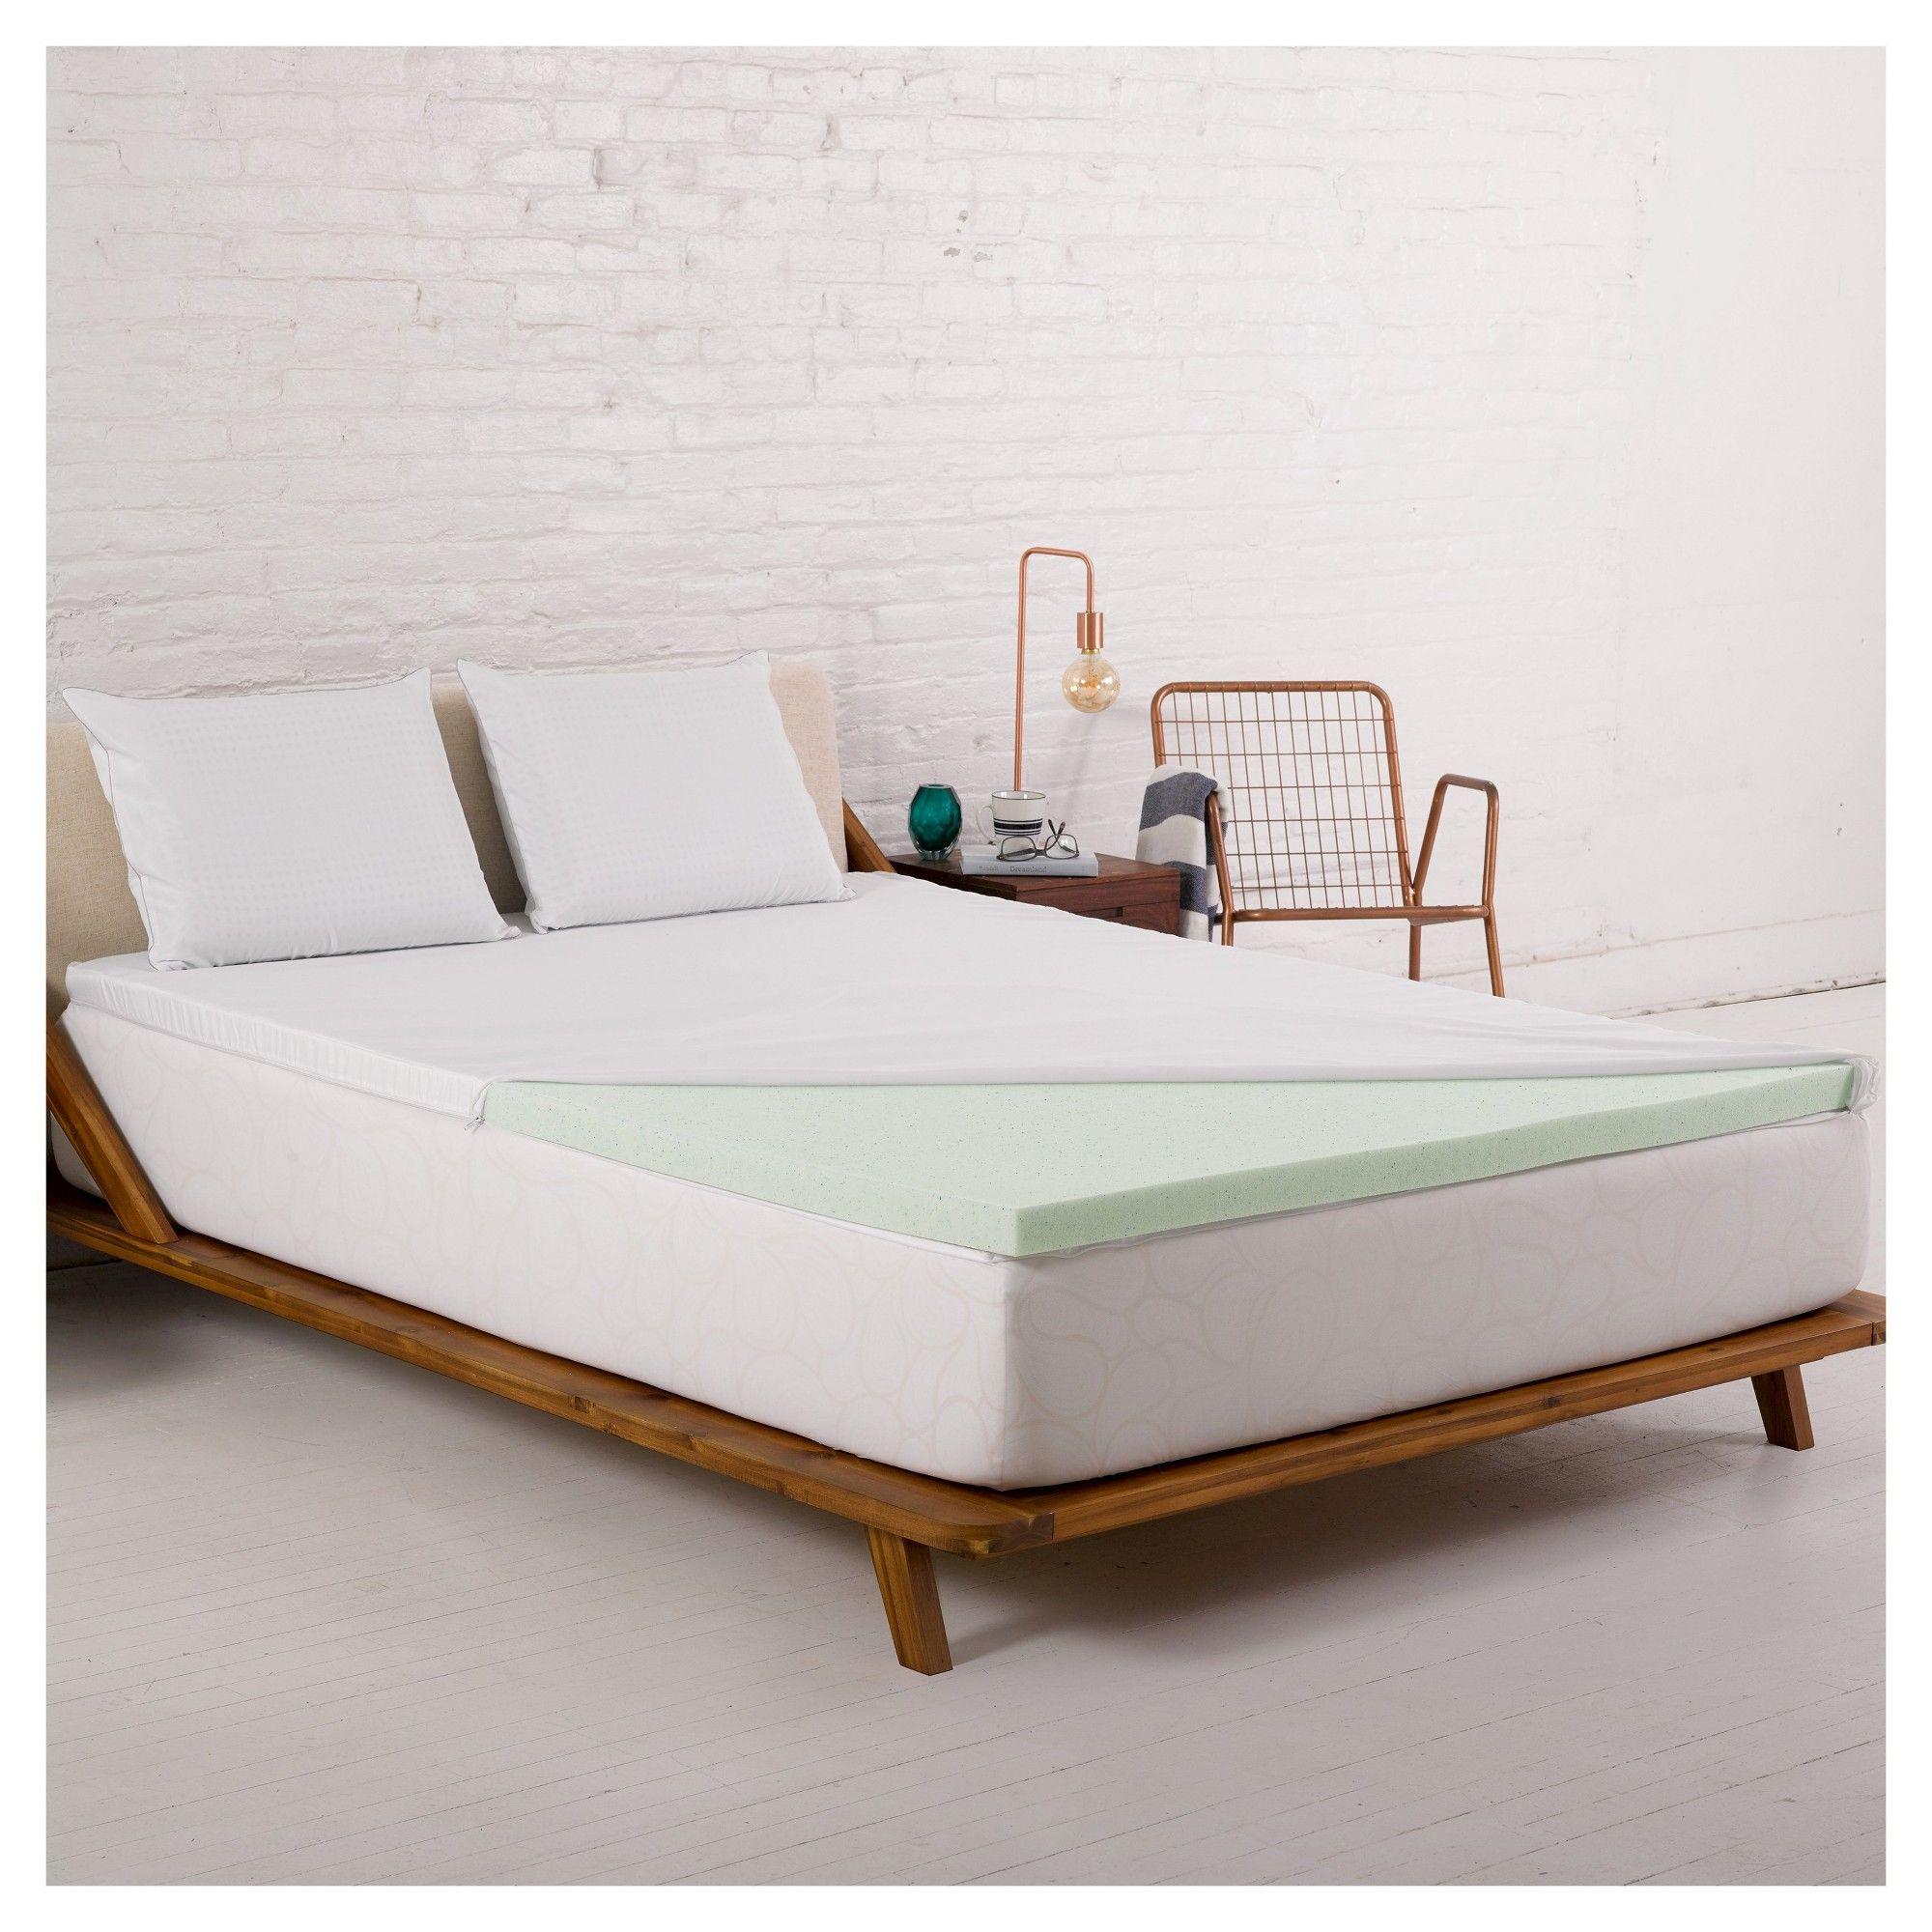 2 temperature regulating gel foam mattress topper with cover